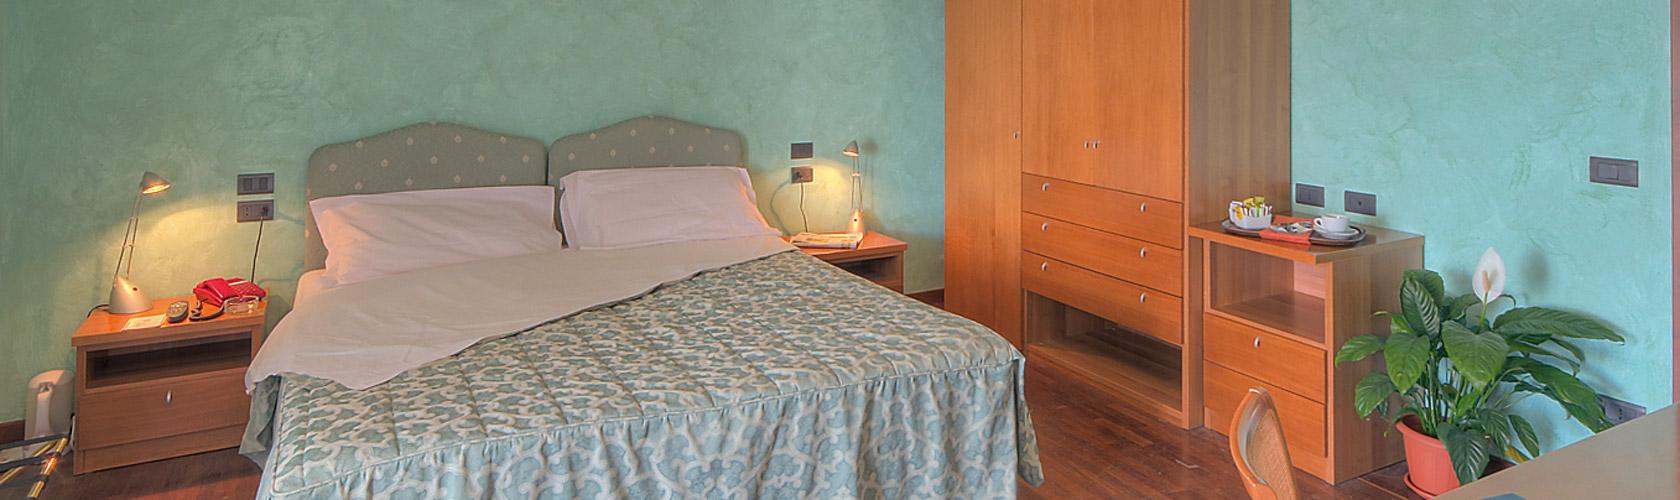 hotel-ancona-sud-03